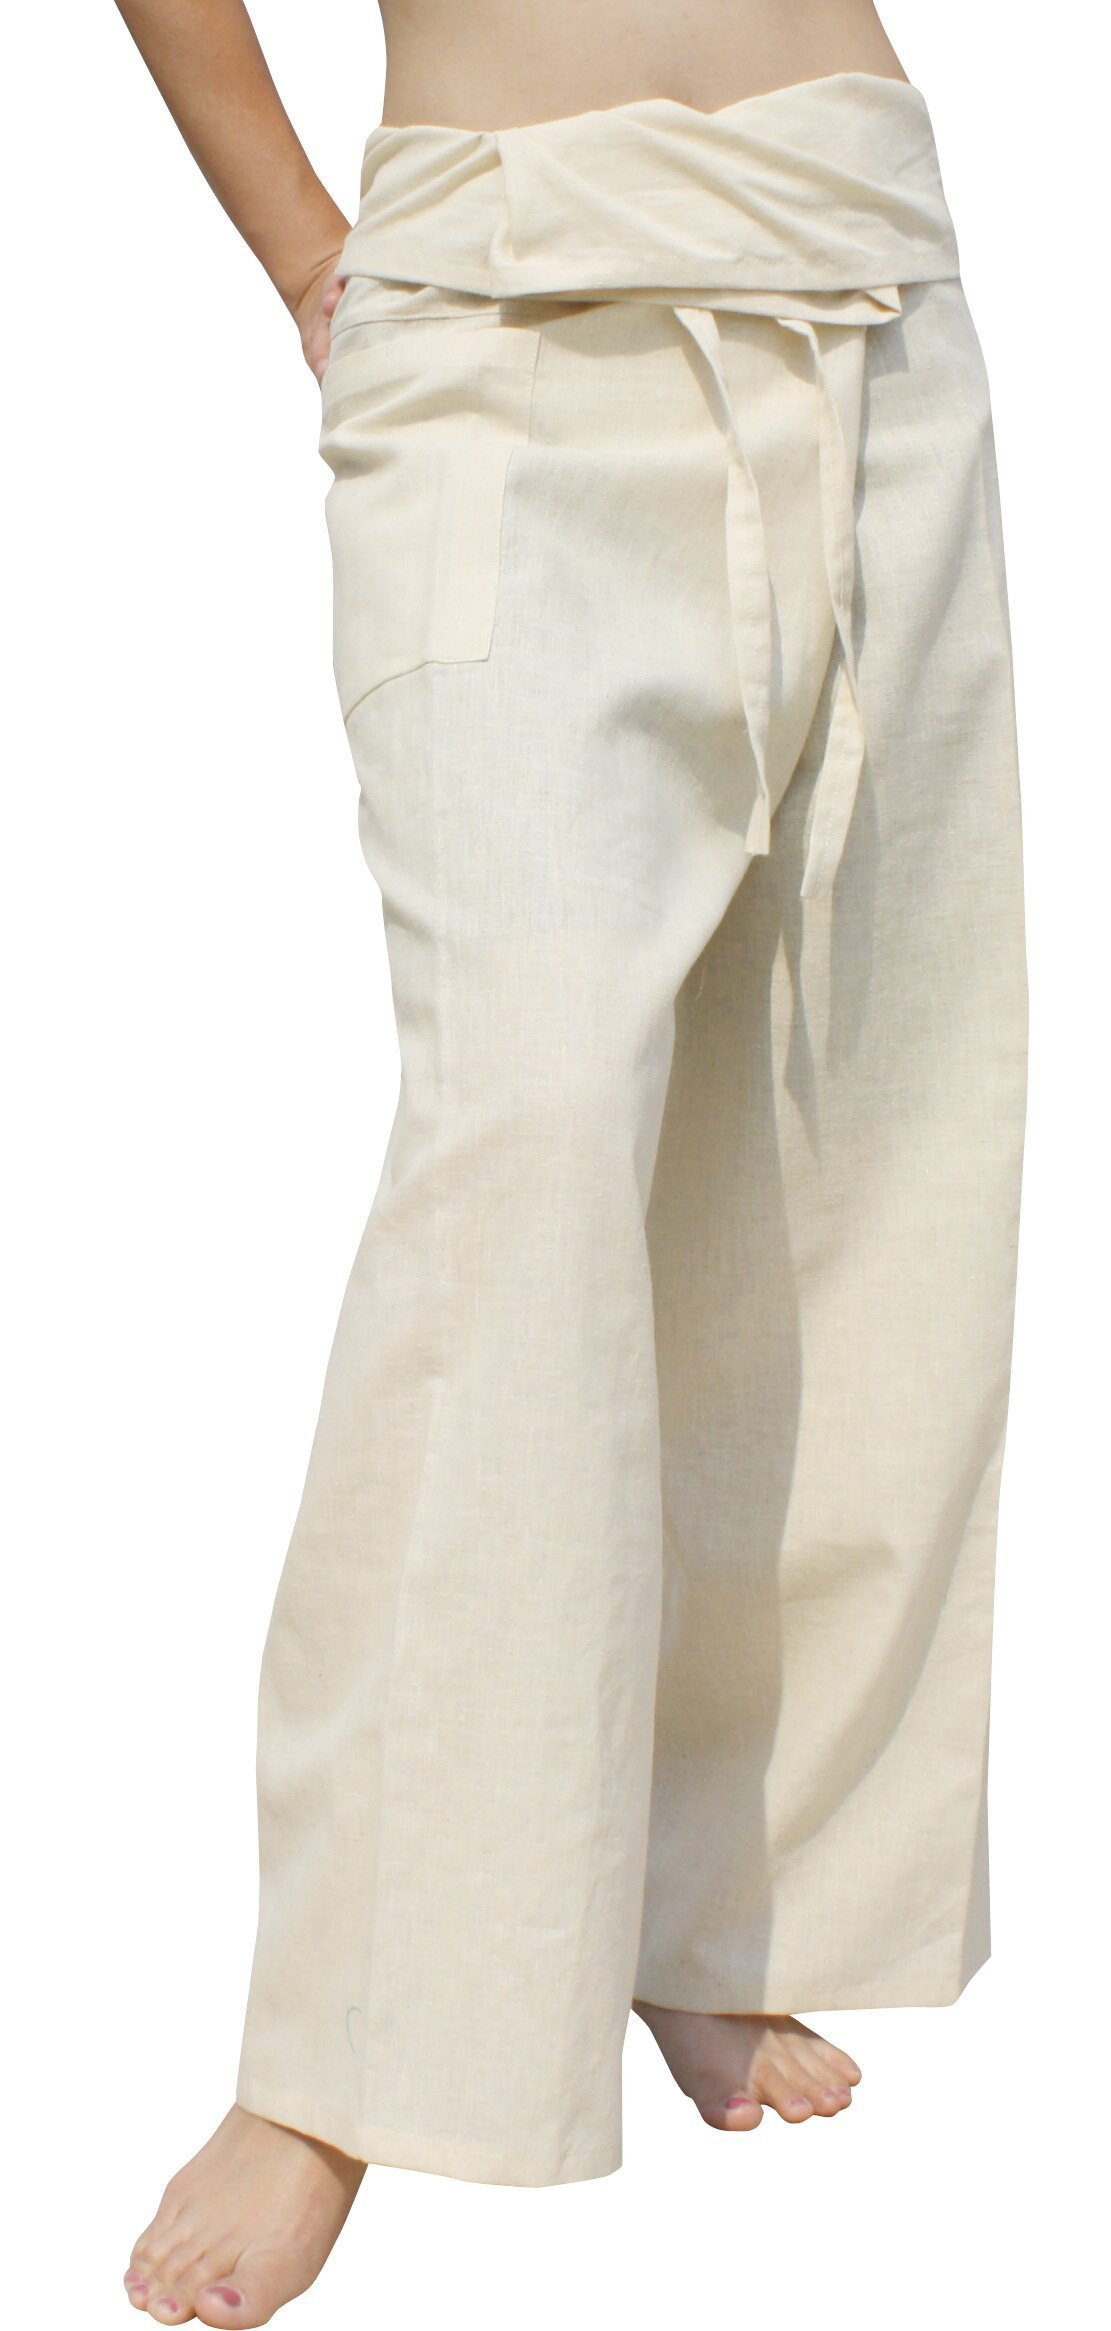 Raan Pah Muang High Grade Chinese 55% Hemp 45% Cotton Thai Fisherman Wrap Pants, X-Large, Ivory Cream by Raan Pah Muang